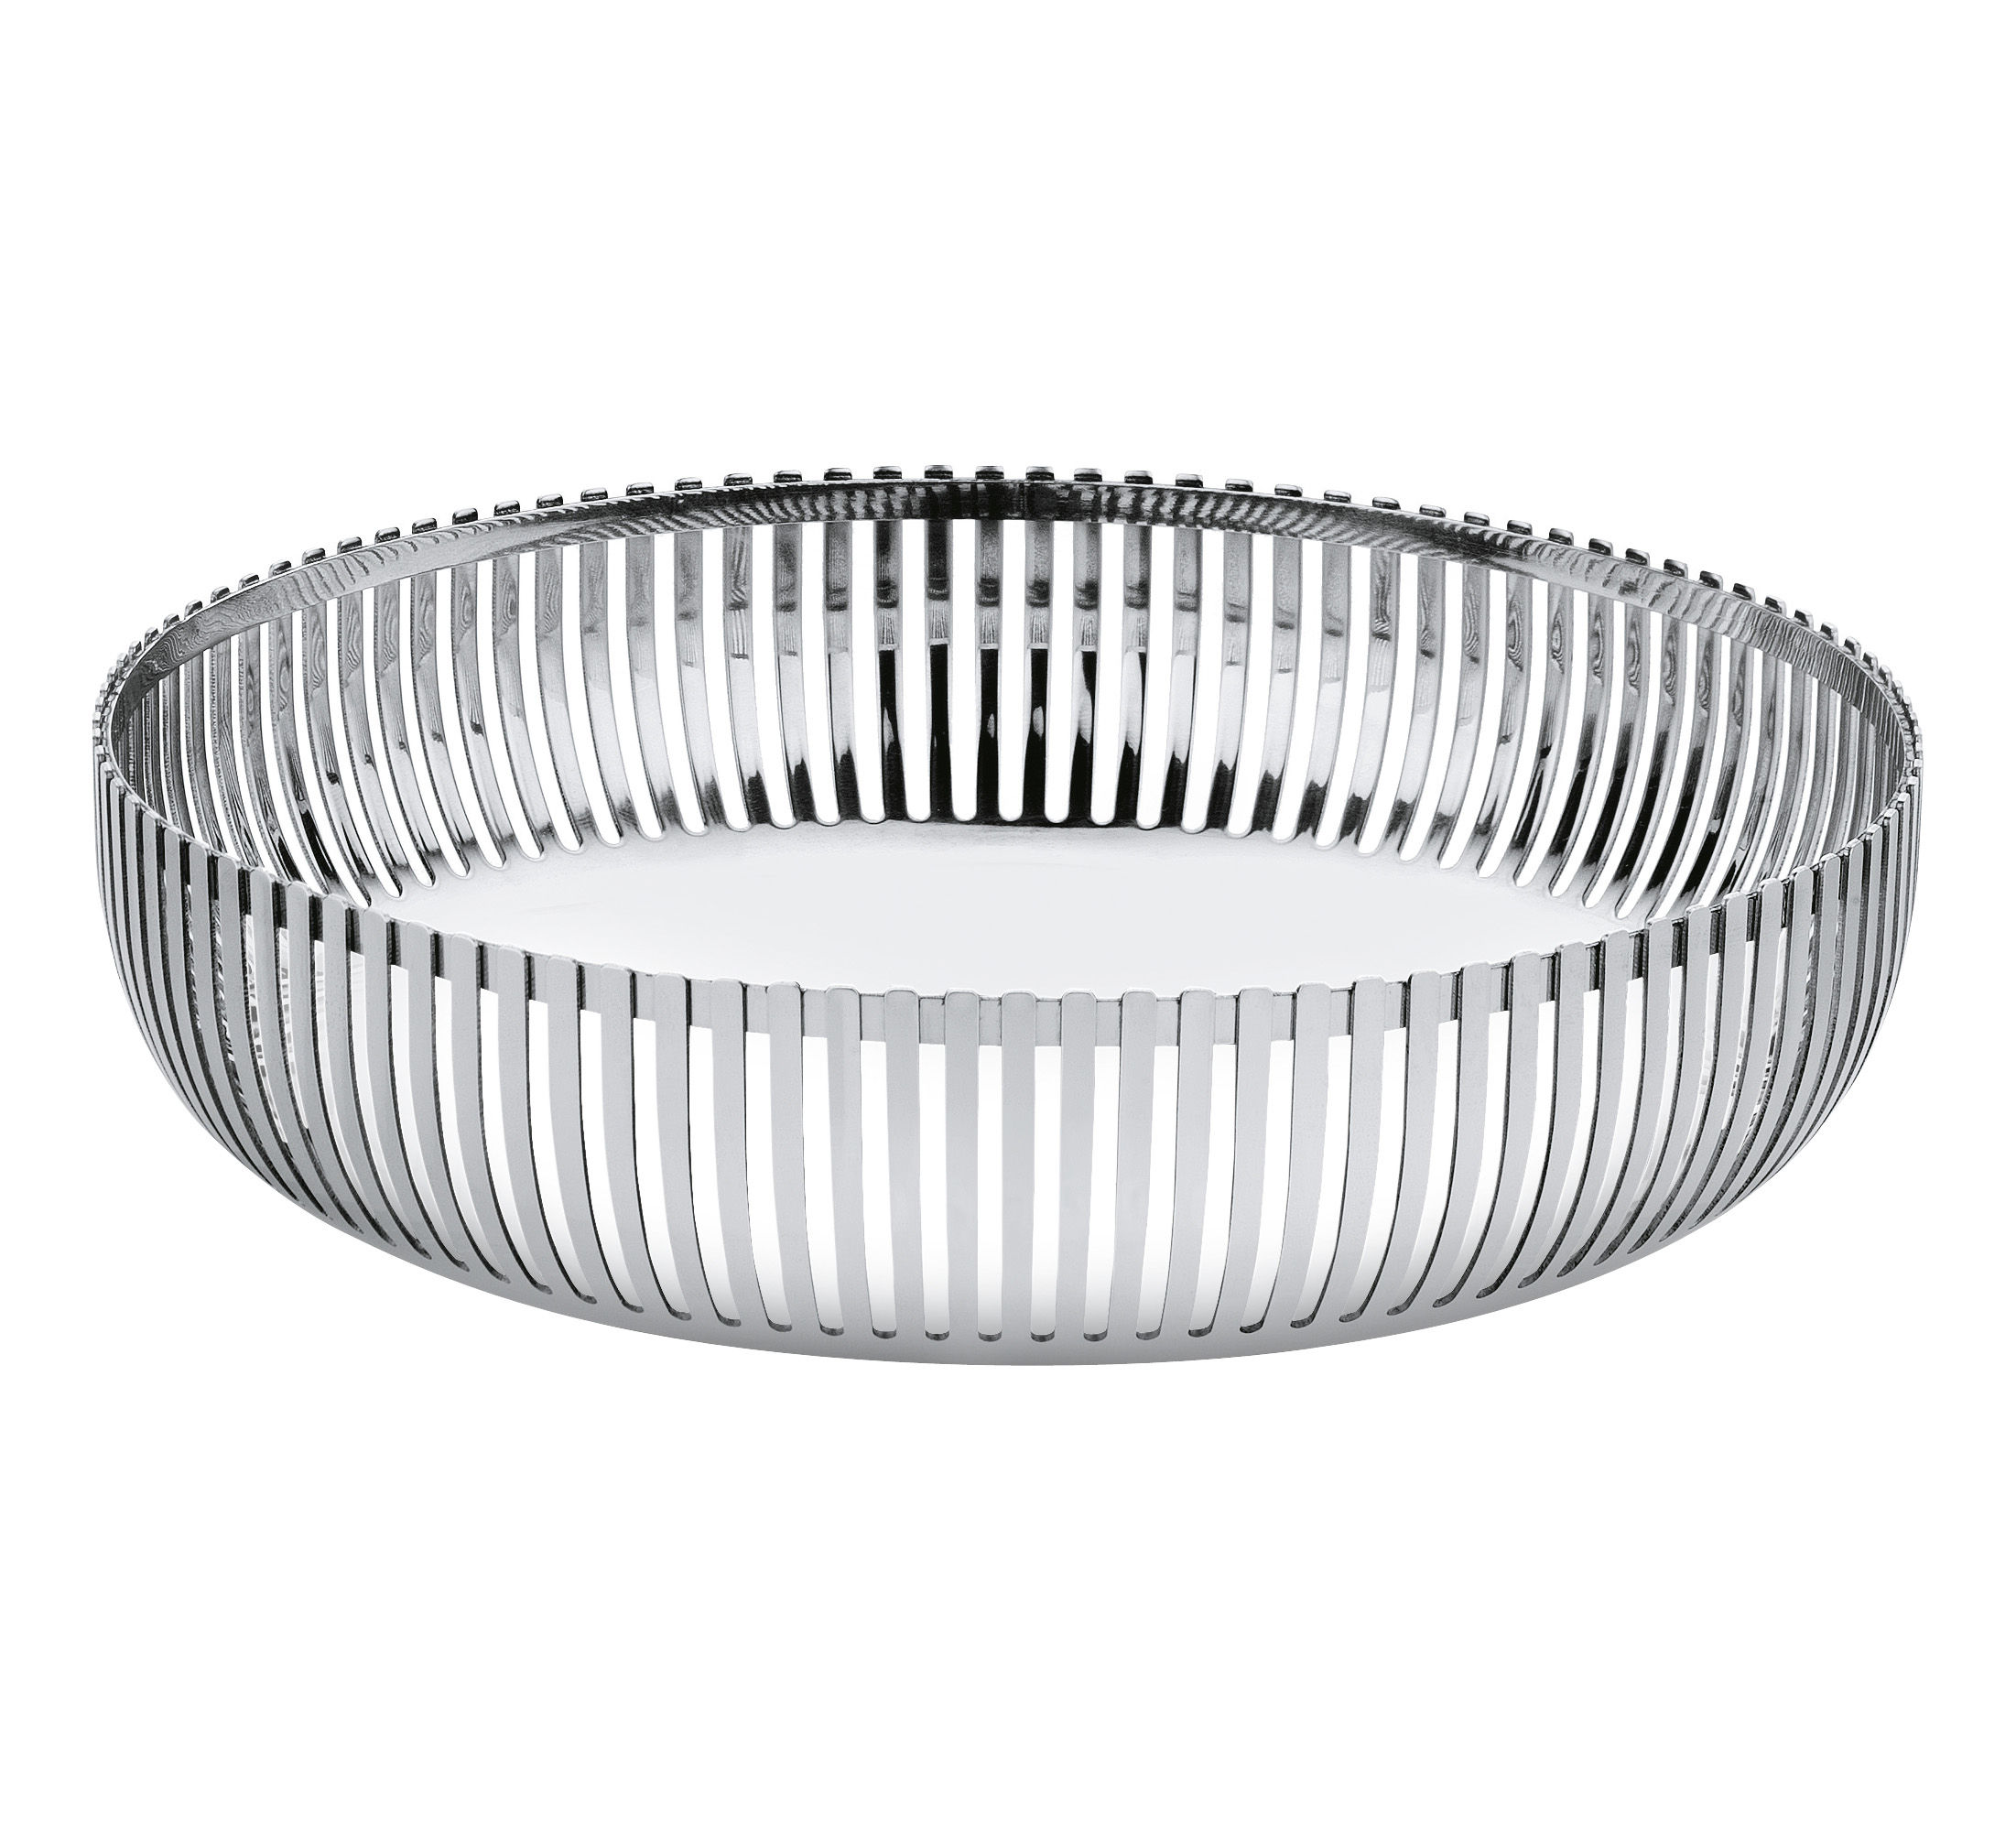 Tableware - Fruit Bowls & Centrepieces - PCH02 par Pierre Charpin Basket - Ø 20 cm by Alessi - Ø 20 cm - Mirror polished steel - Polished stainless steel